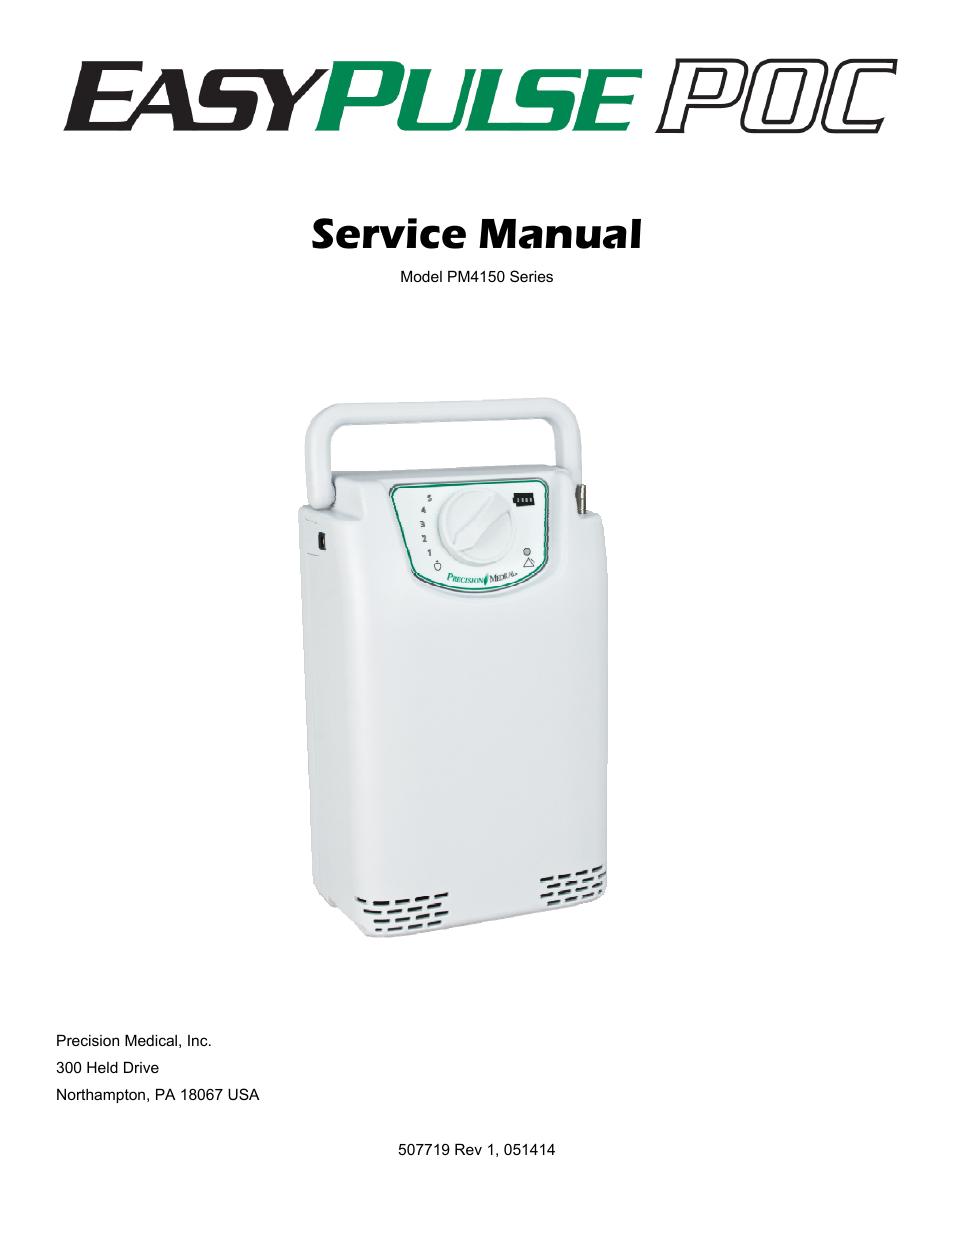 Airsep Visionaire 5 Service Manual